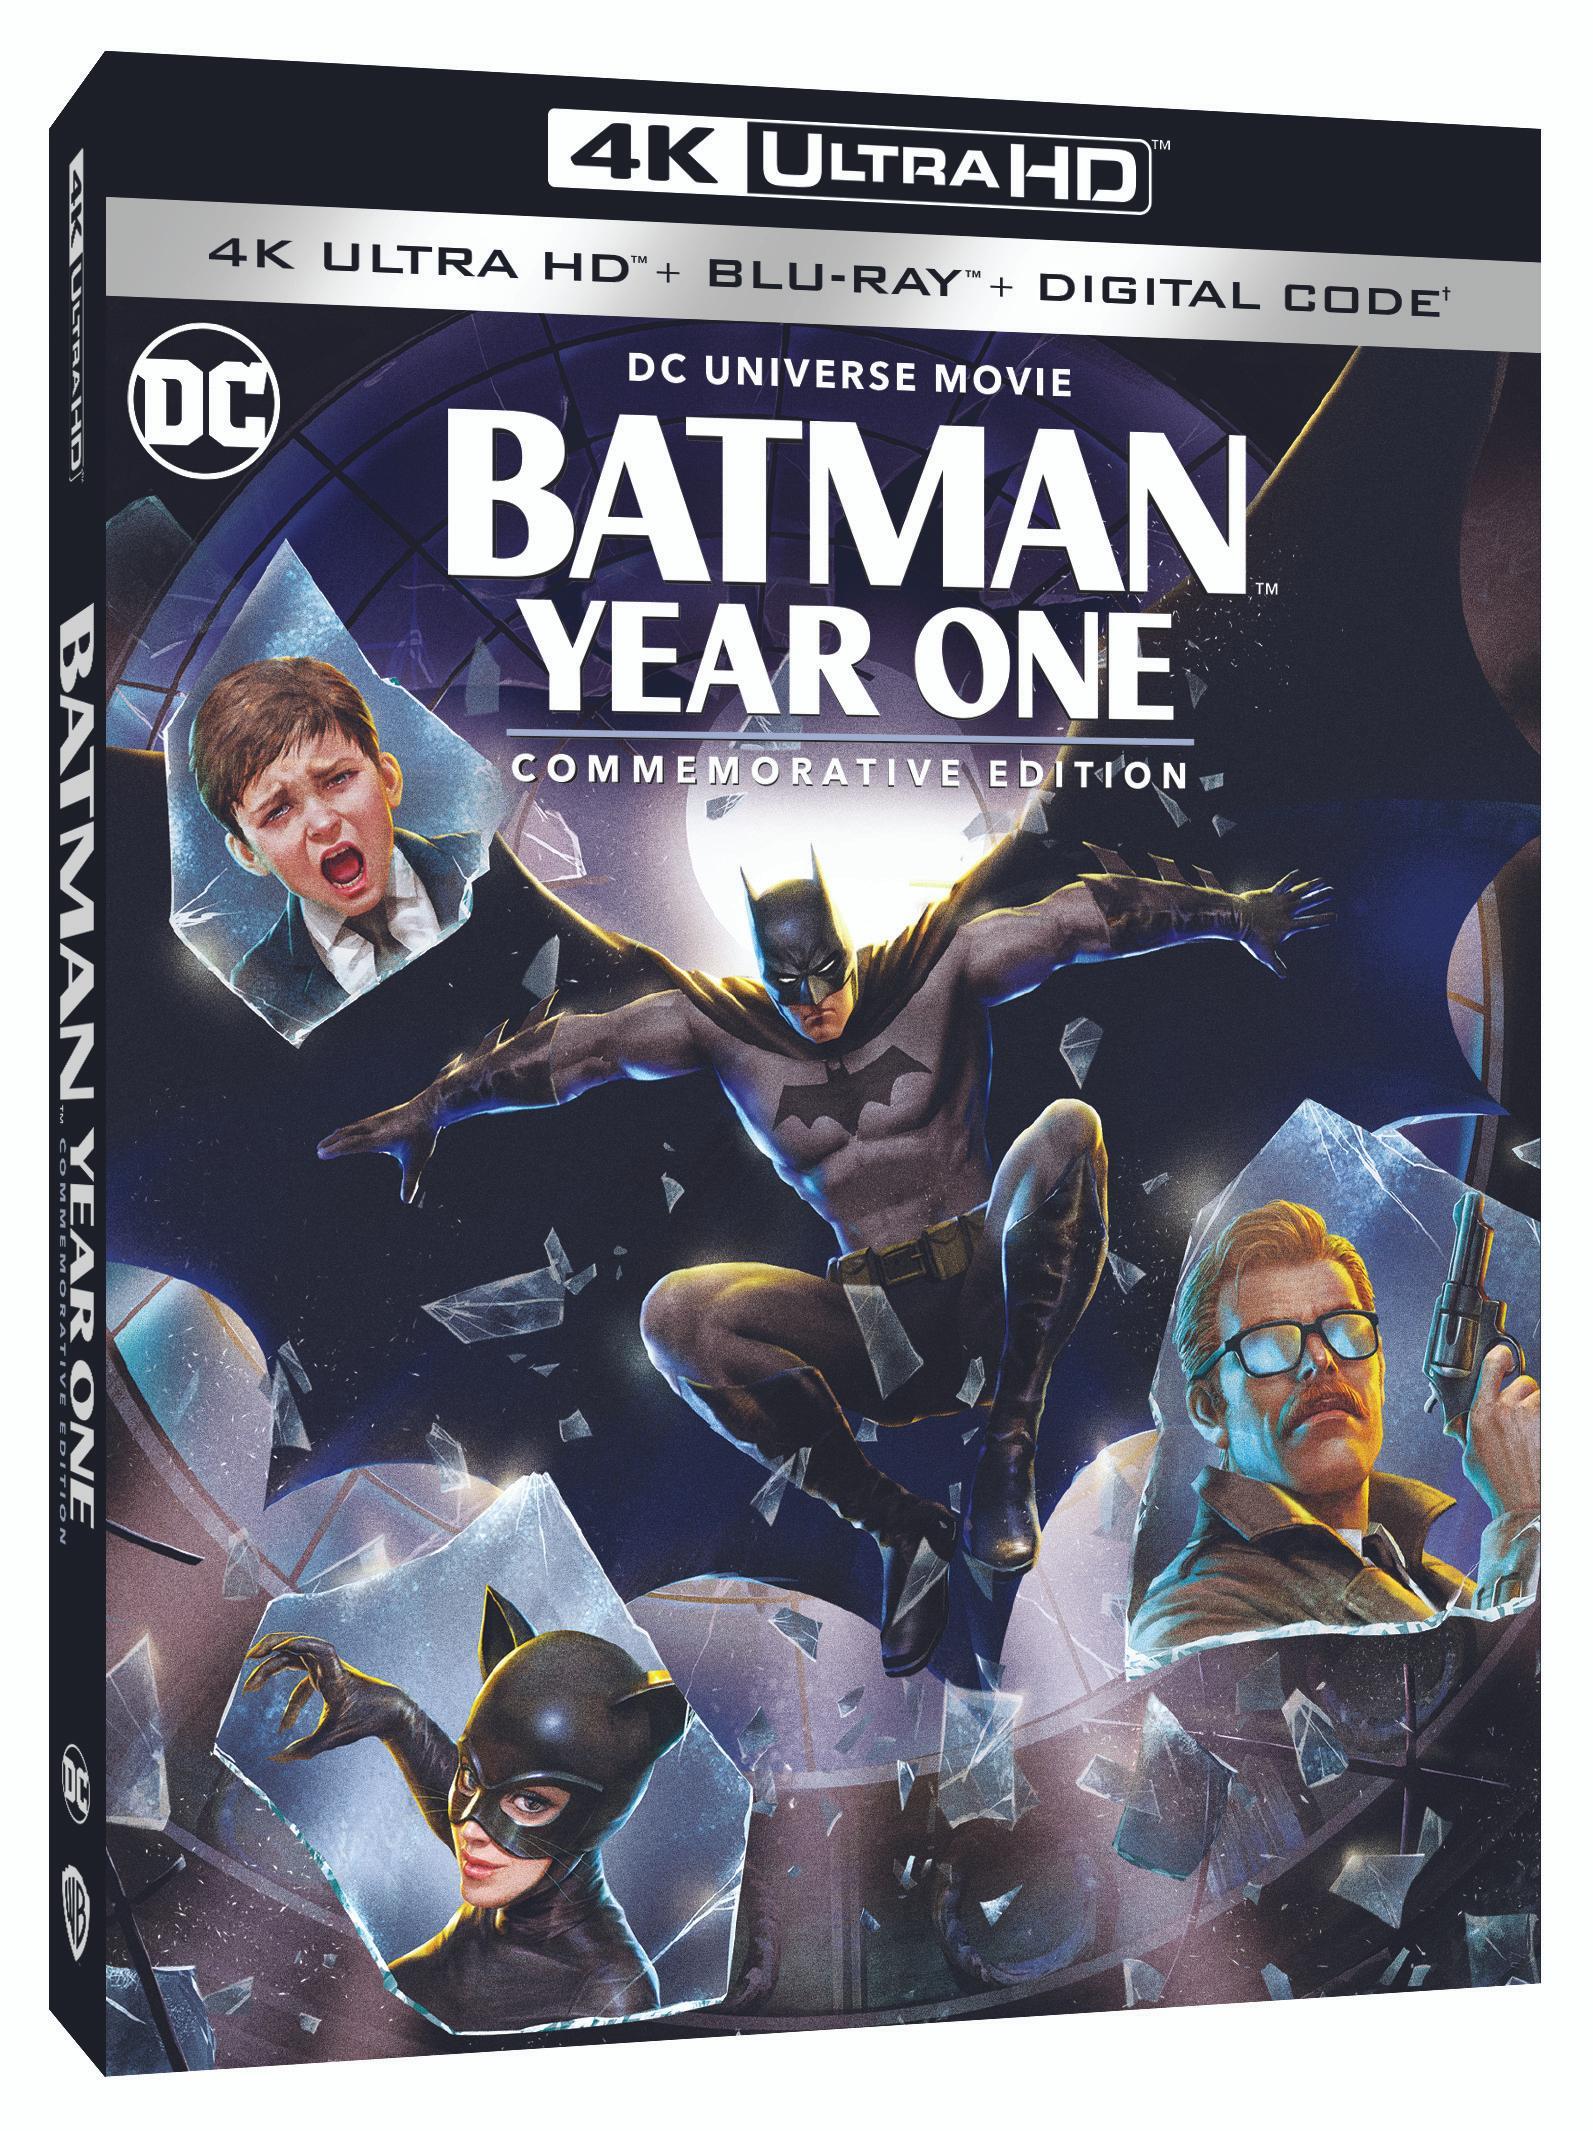 Batman Year One animated